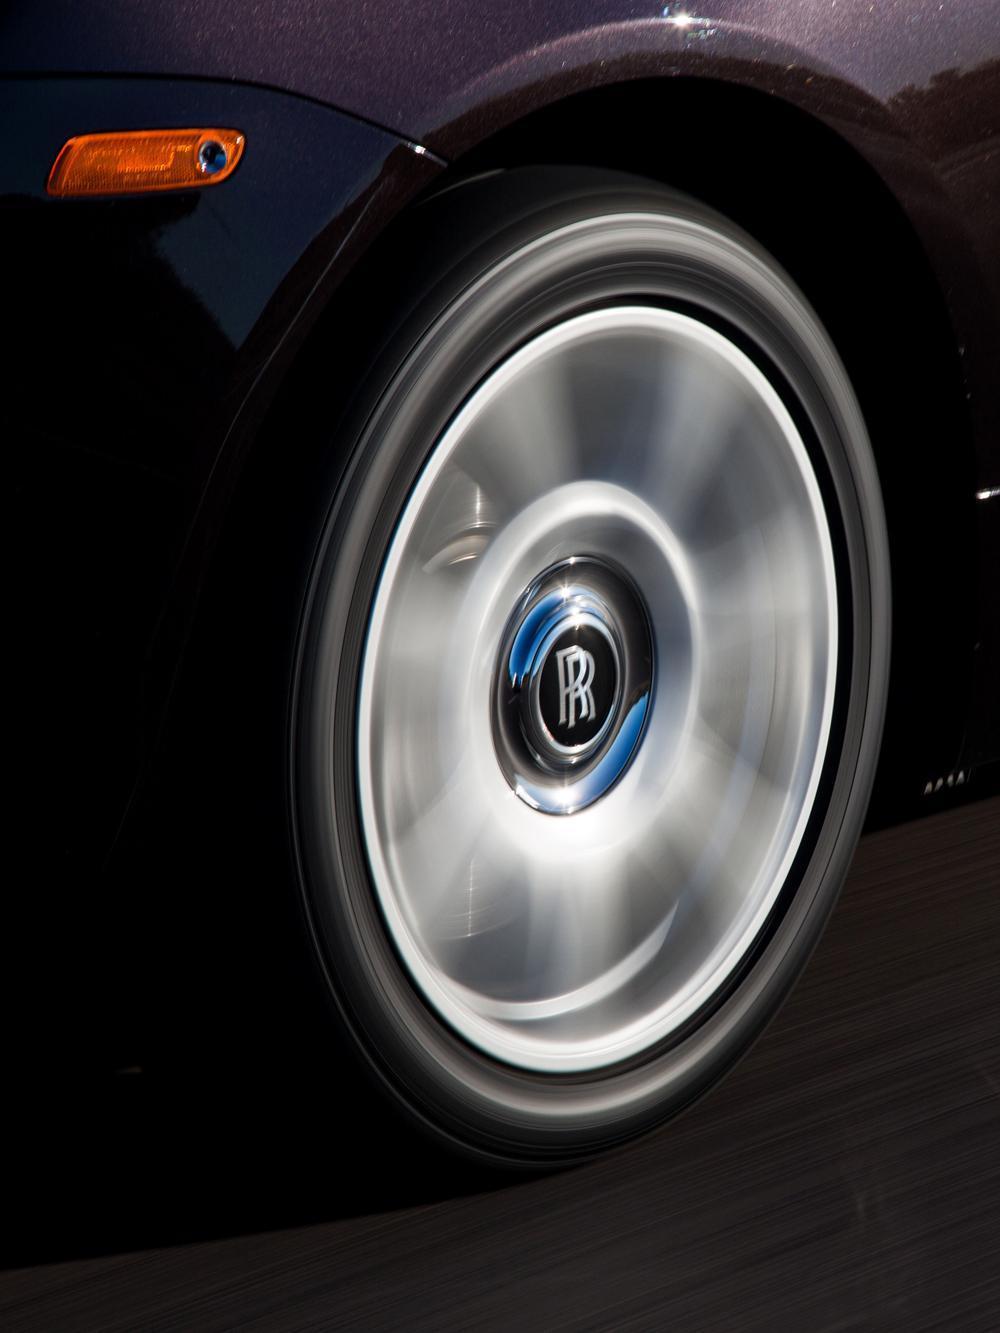 Rolls-Royce在車標上安裝了超潤滑軸承,並在雙R標誌下方加上配重,無論輪圈如何轉動,中心的Rolls-Royce車標永遠為正向而不會倒轉。